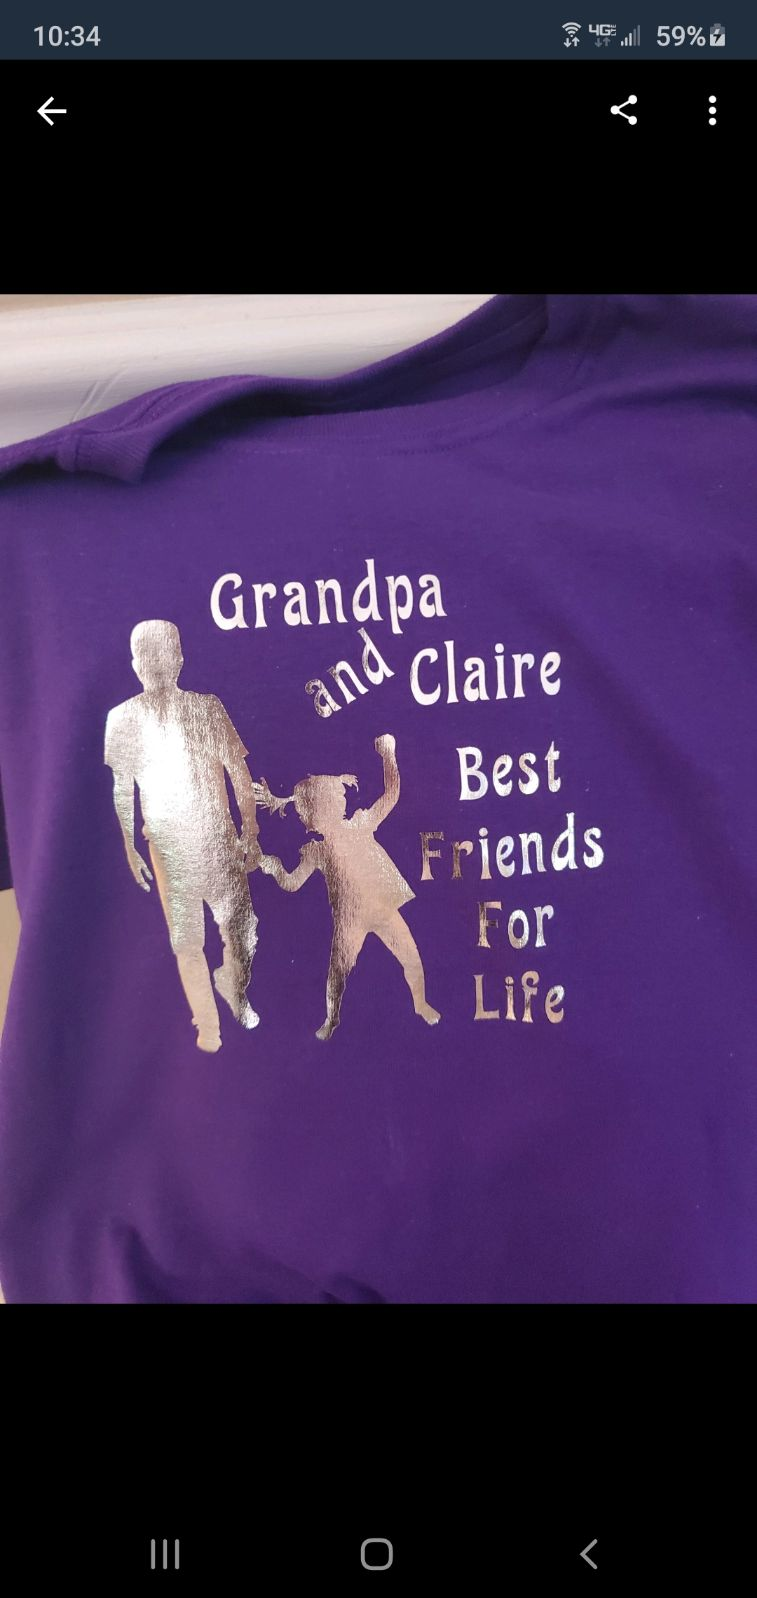 T-shirt for grandson or granddaughter wh